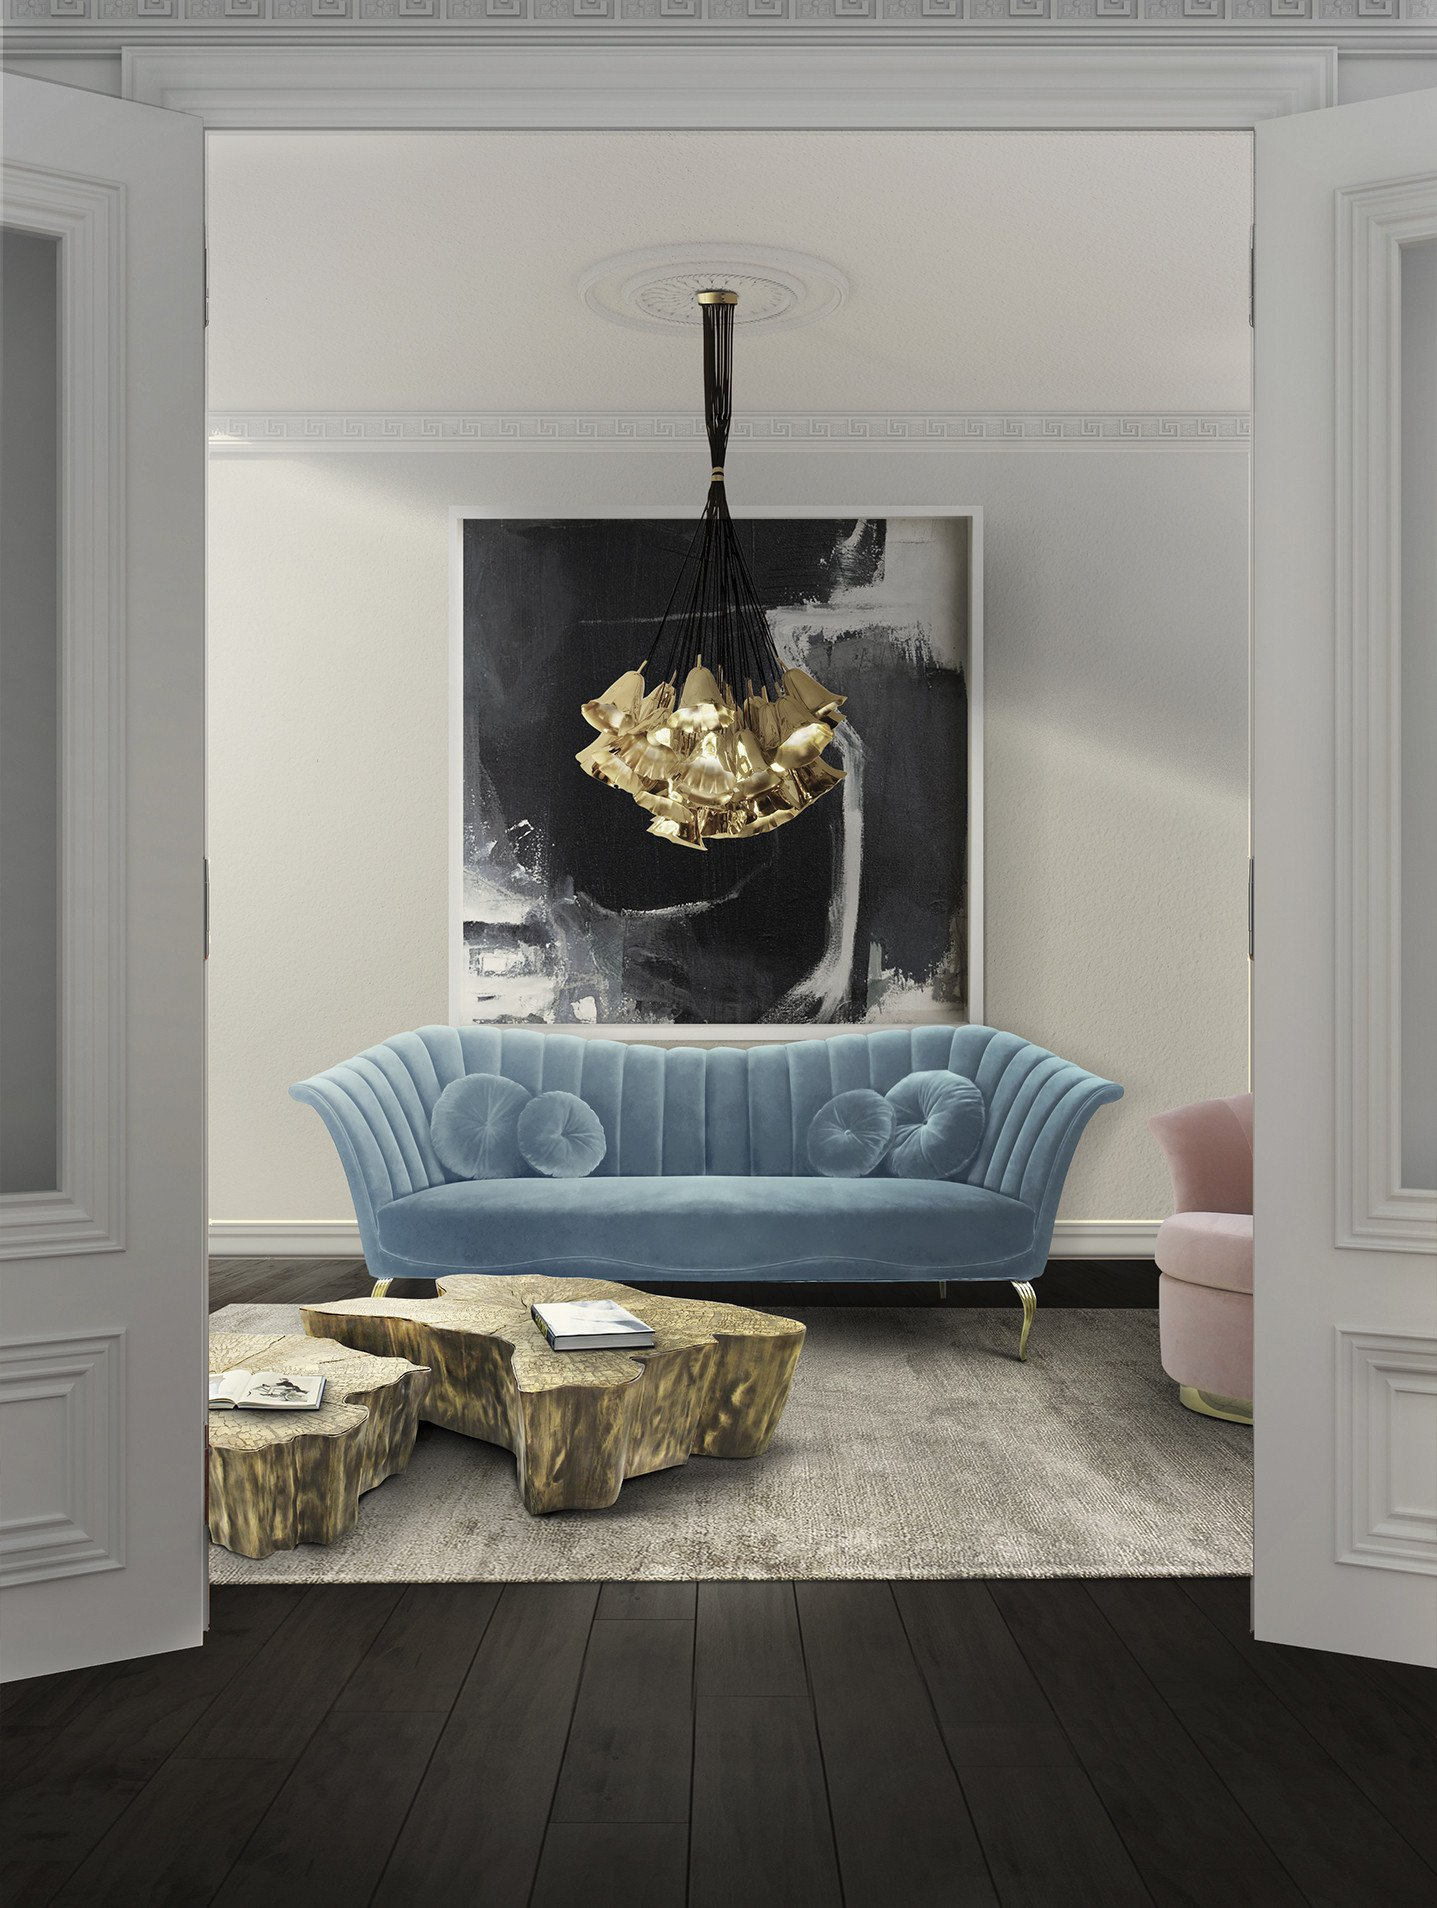 Bedroom before and after Elegant 16 Spectacular Gray Hardwood Floors Bedroom